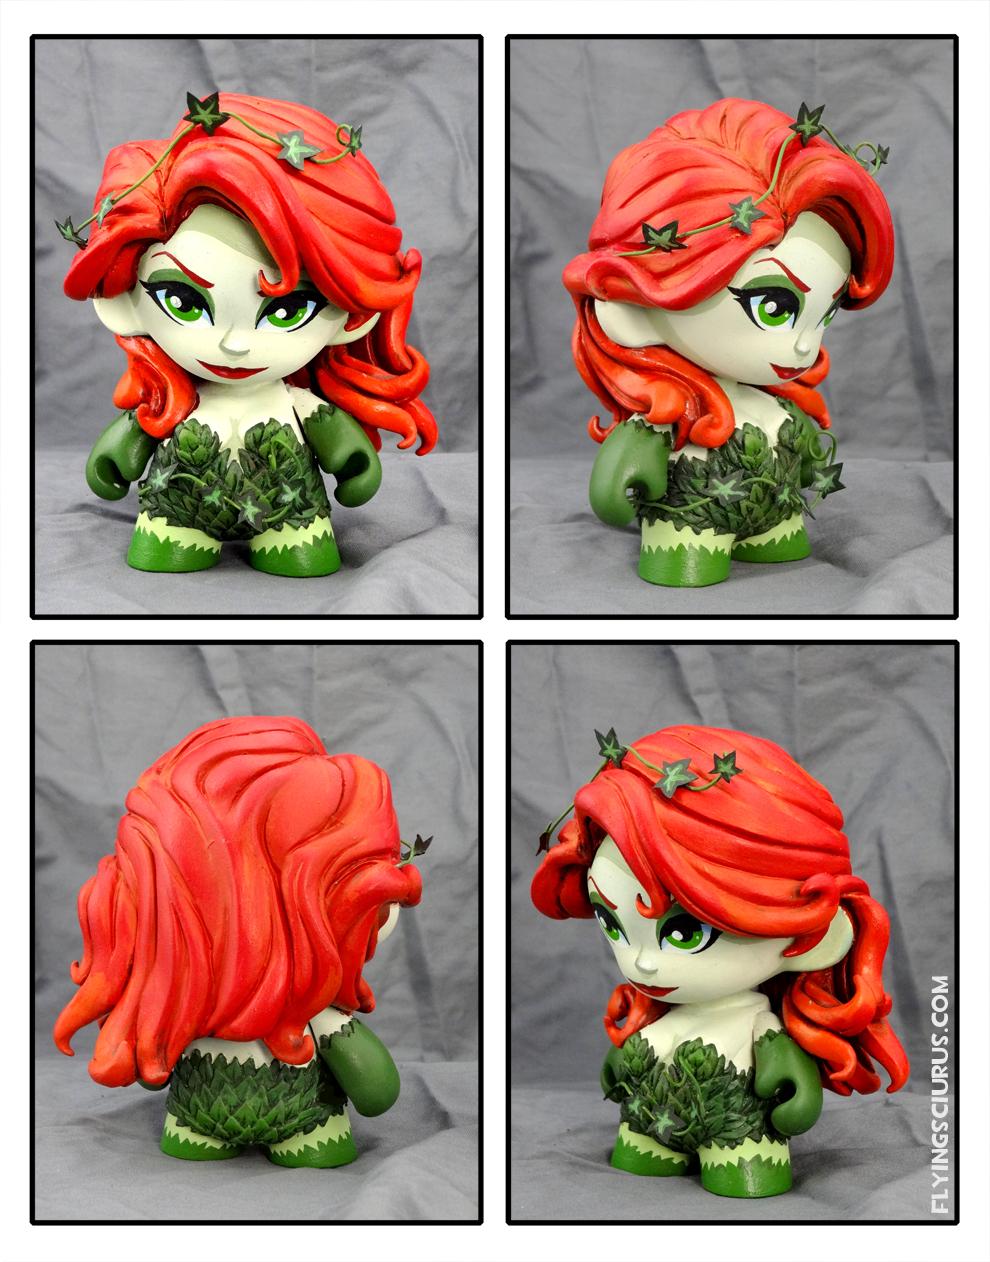 Poison Ivy custom Munny figure by FlyingSciurus